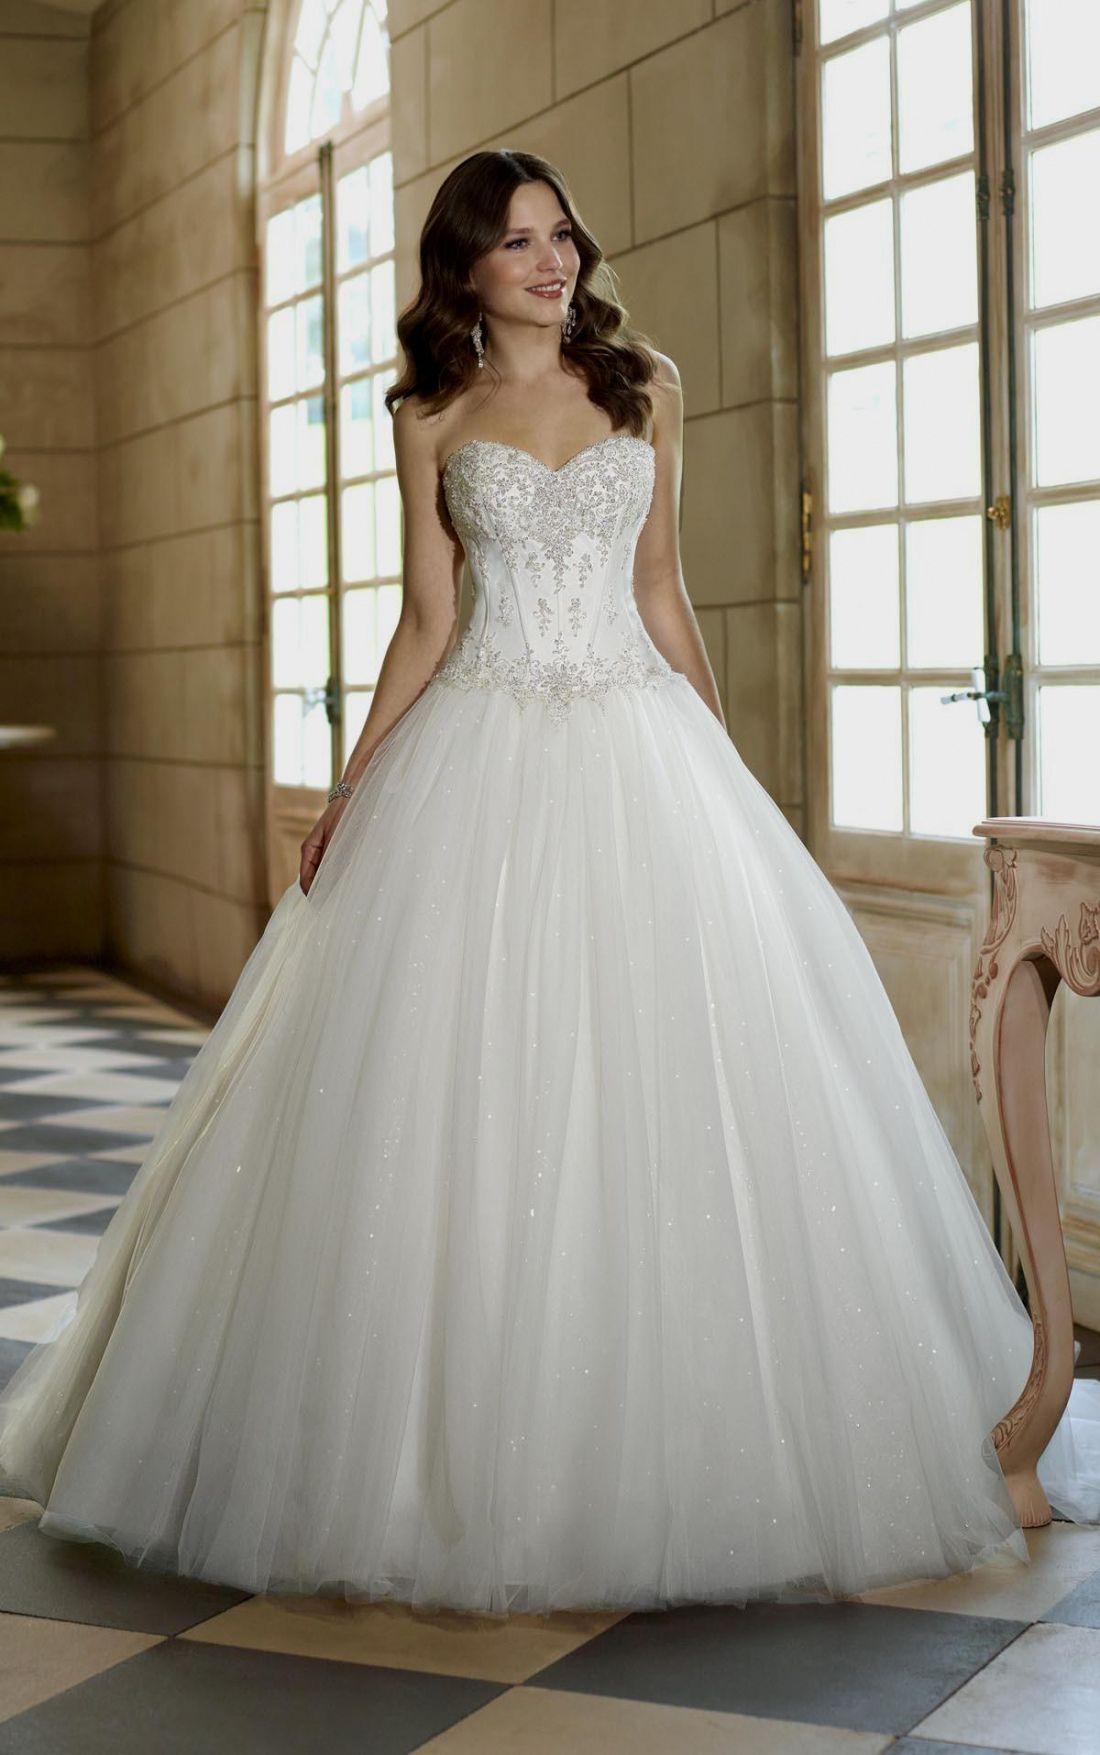 Strapless ball gown wedding dresses   Strapless Ball Gown Wedding Dress  Wedding Dresses for Fall